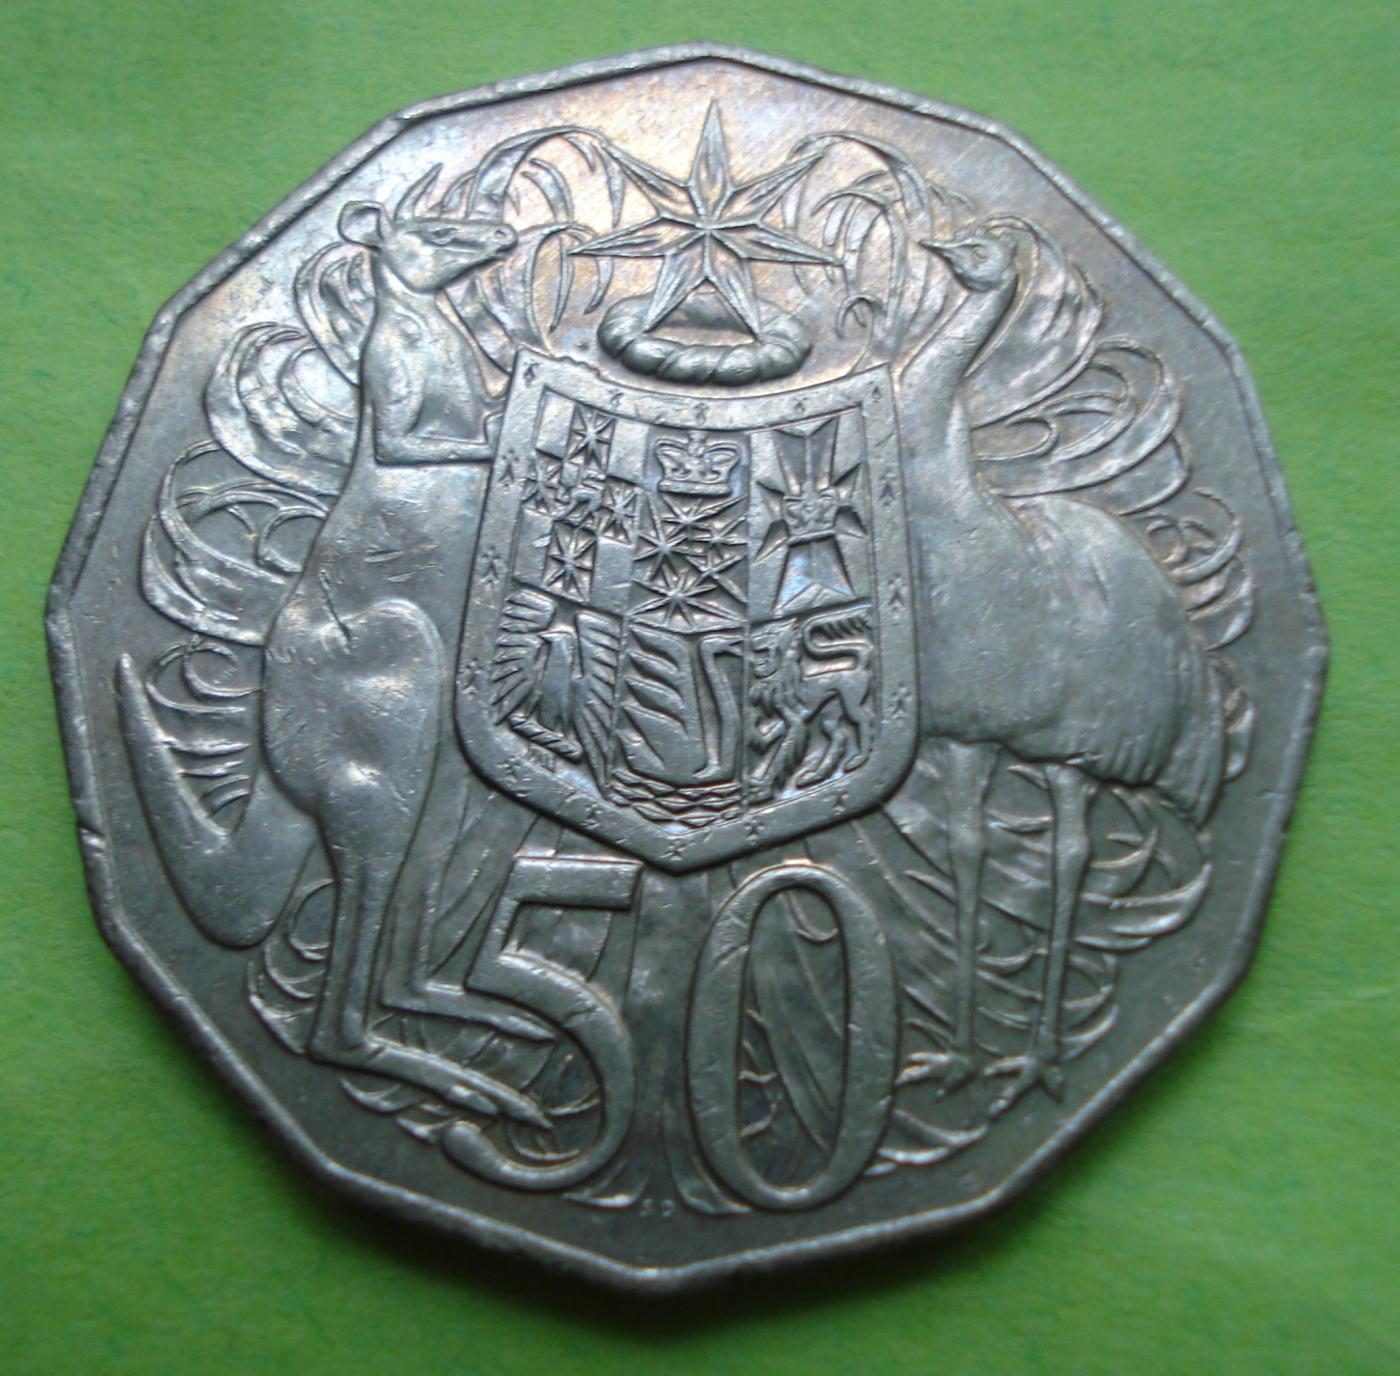 50 Cents 2009 Elizabeth Ii 1952 Present Australia